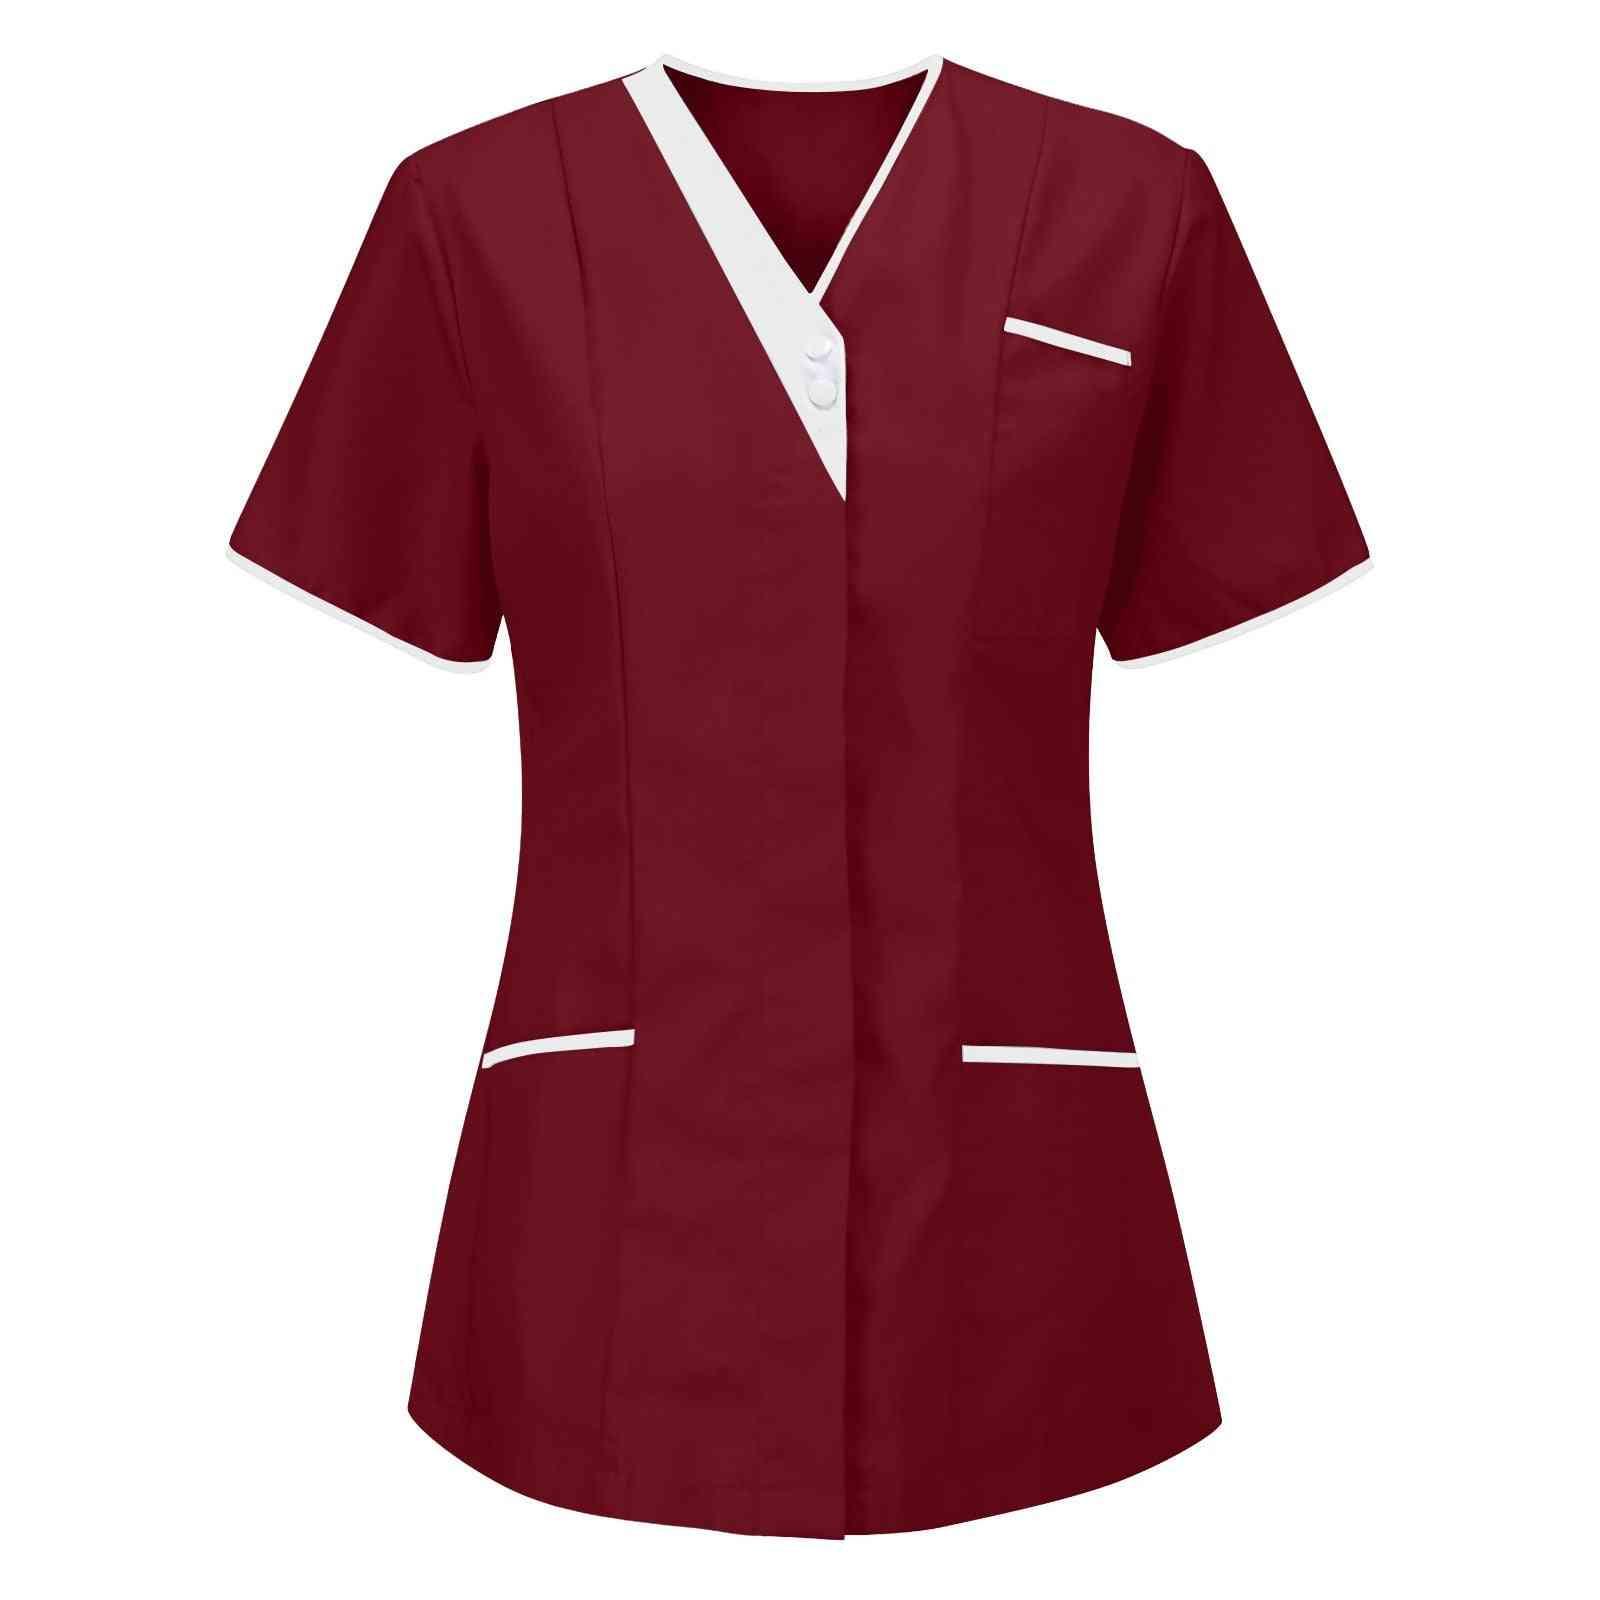 Surgery Scrub Shirt Short Sleeve Uniforms